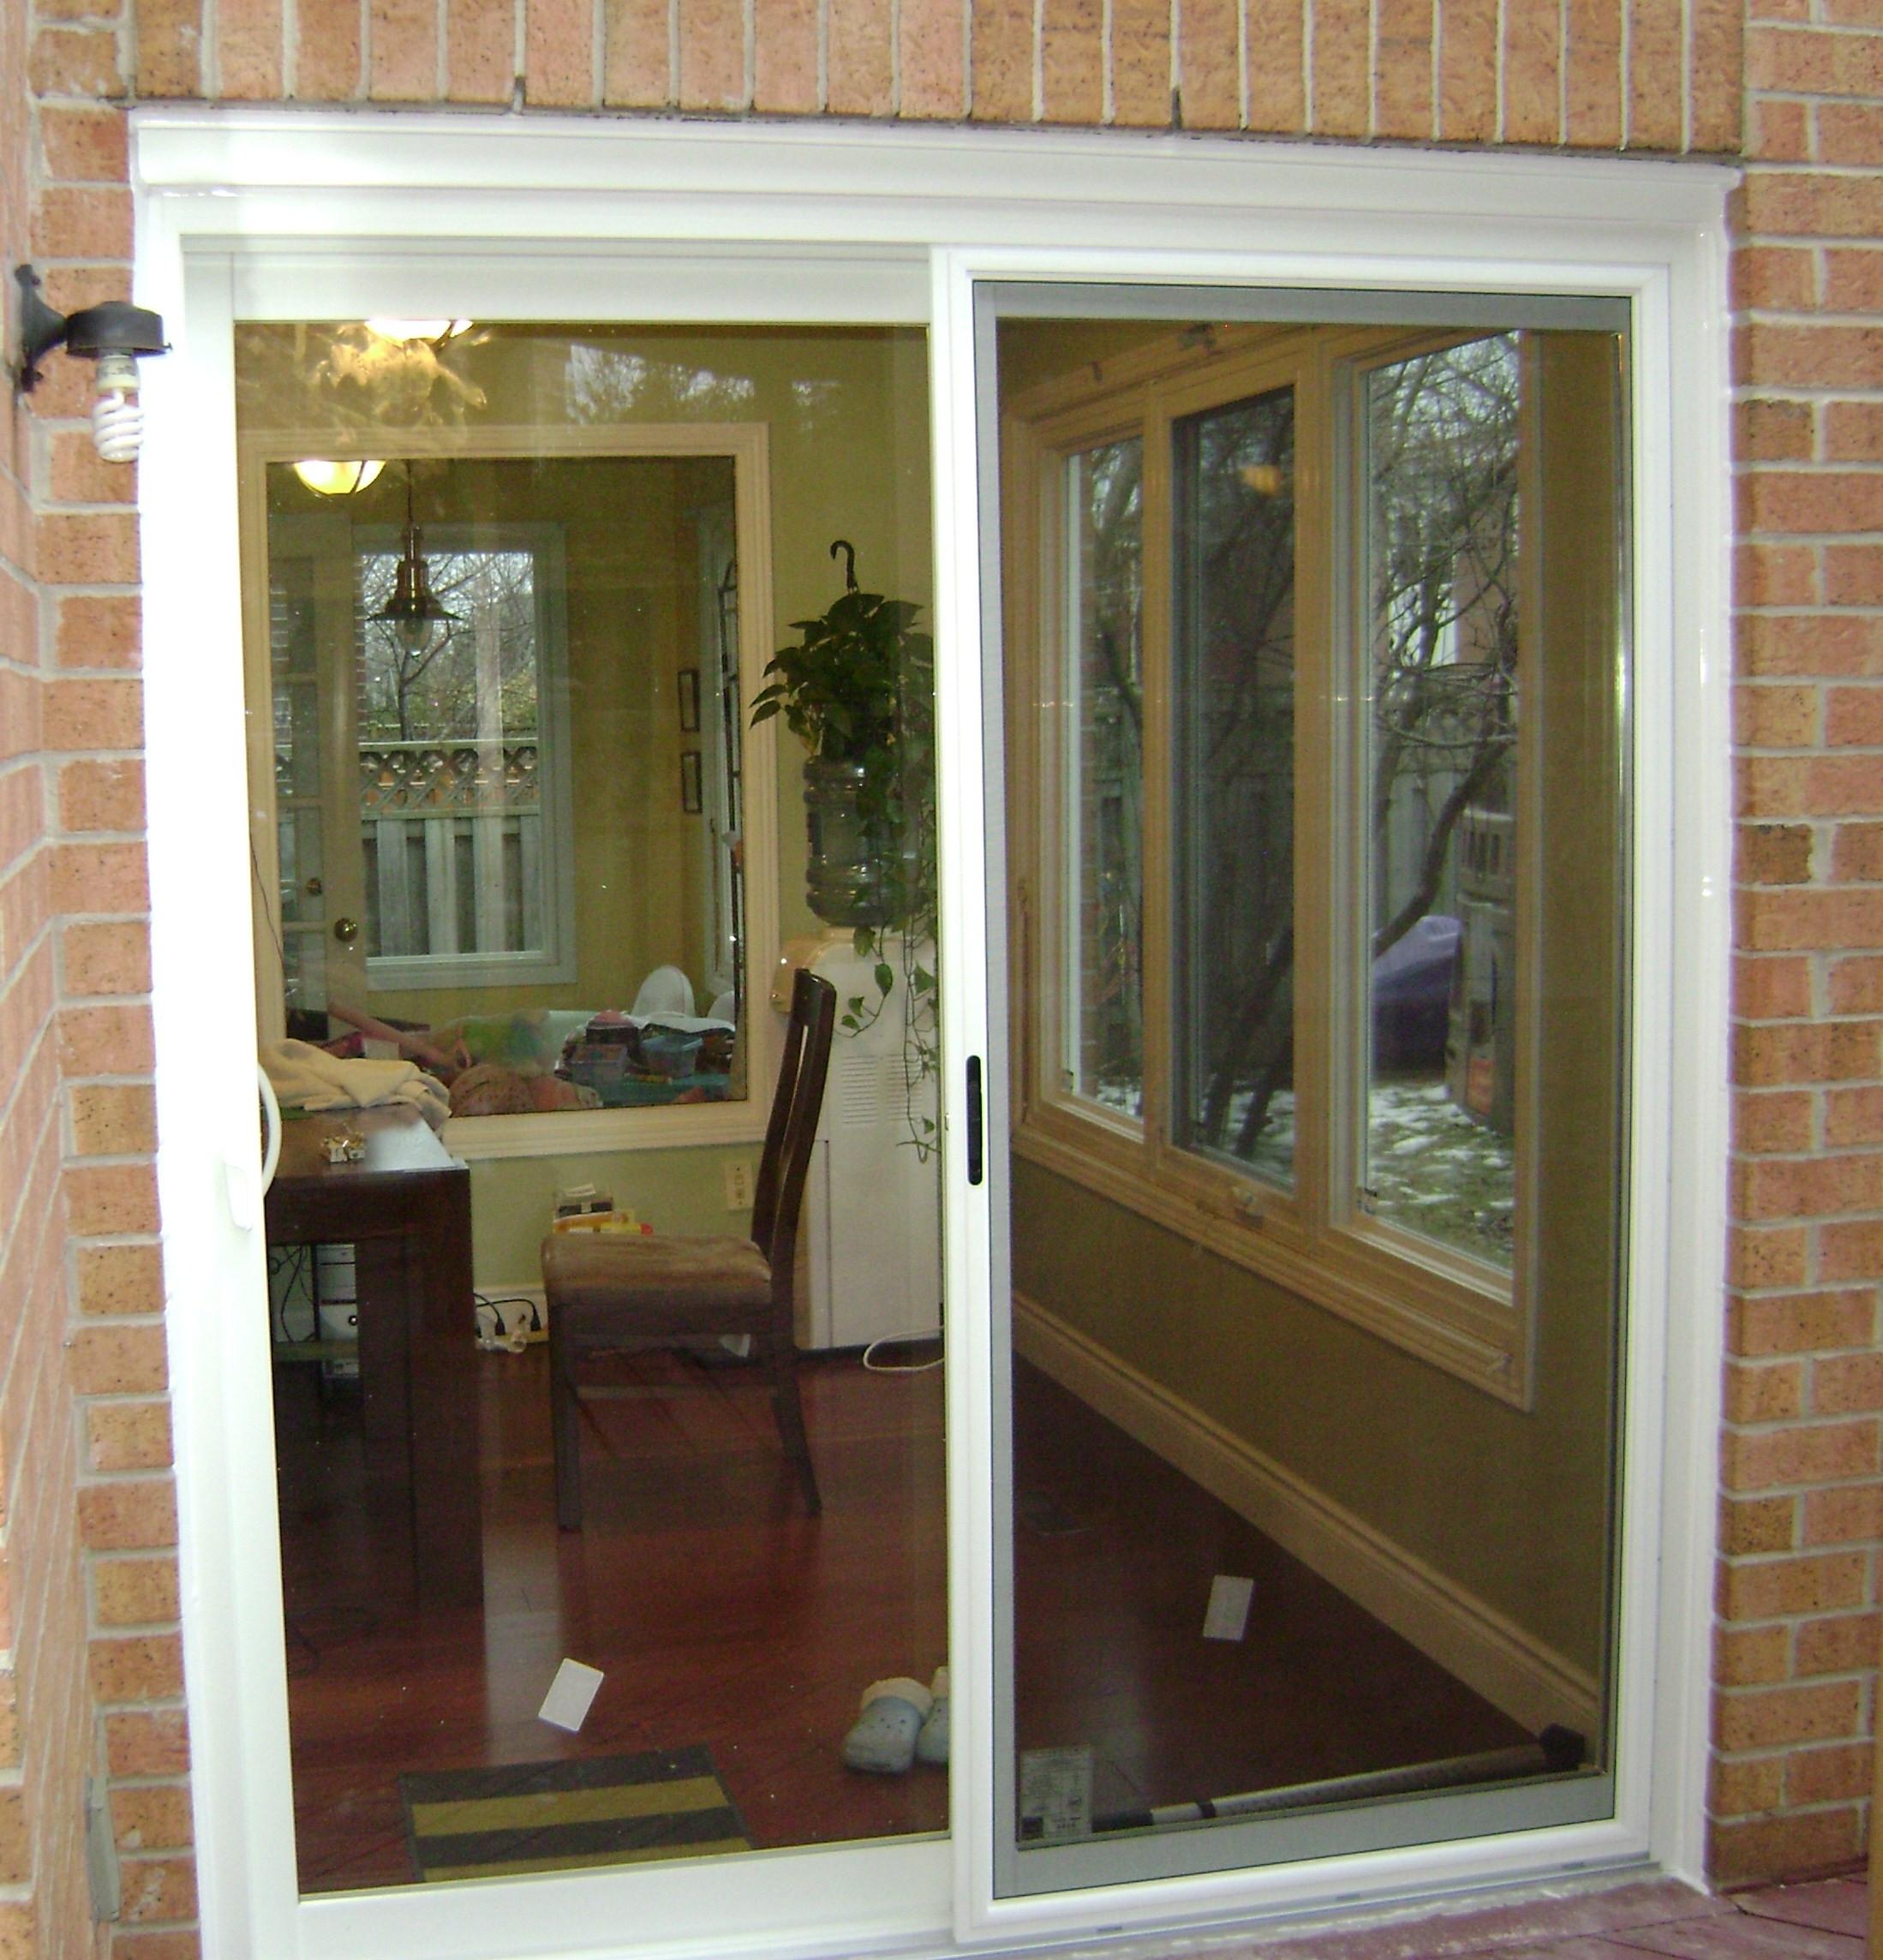 Best ideas about Best Patio Door . Save or Pin Mind Boggling Best Sliding Patio Door Captivating Ft Now.